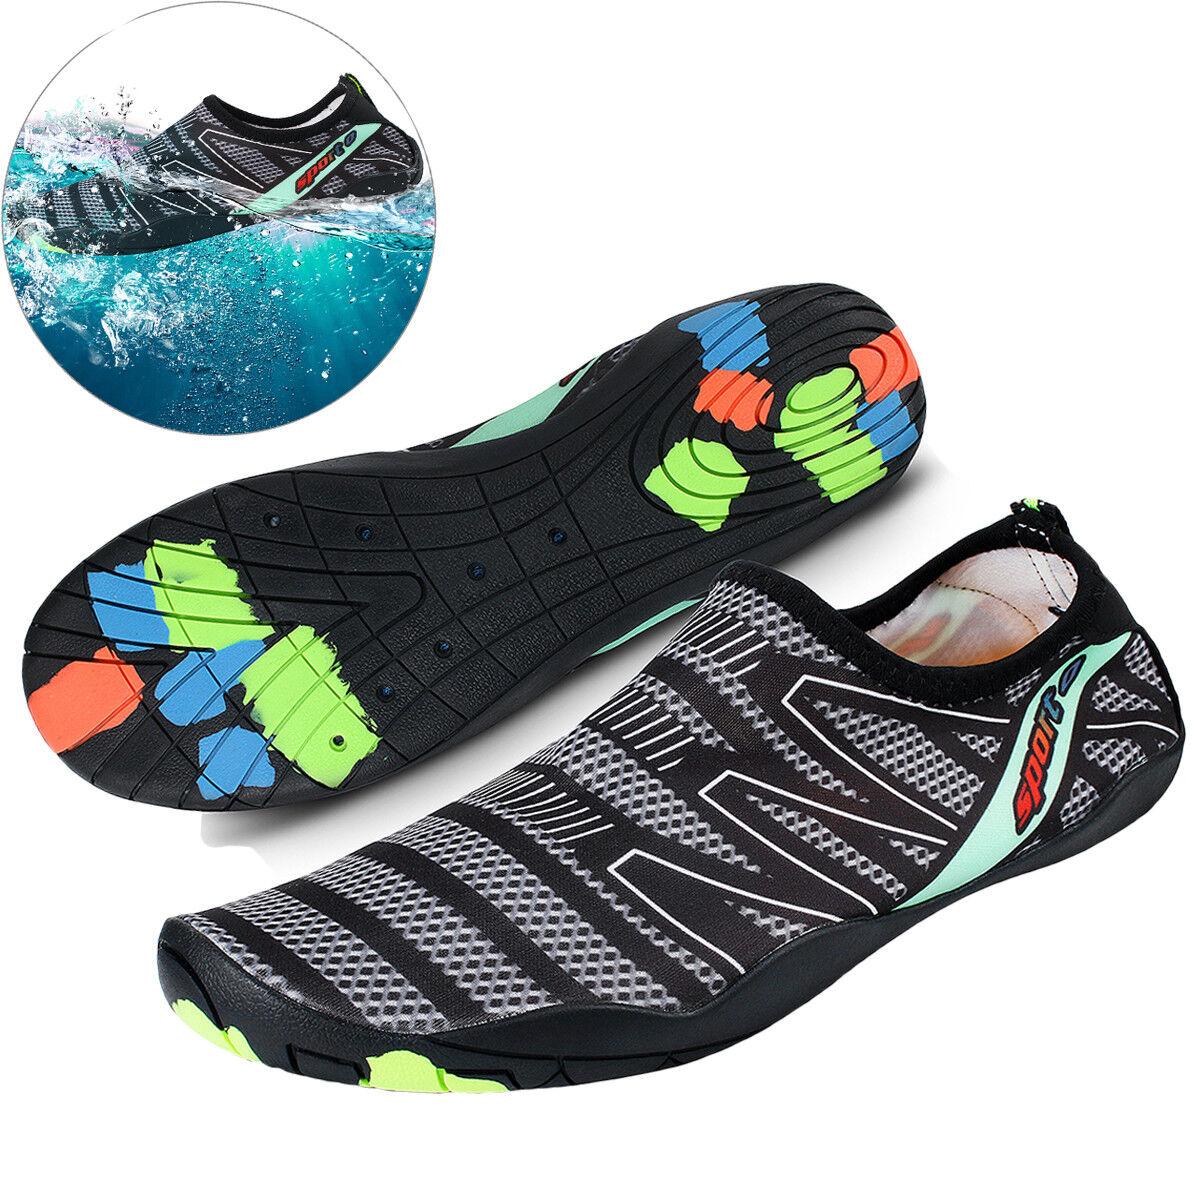 Mens Quick Dry Aqua Water Shoes Barefoot Beach Swim Surf Shoes Walking Running